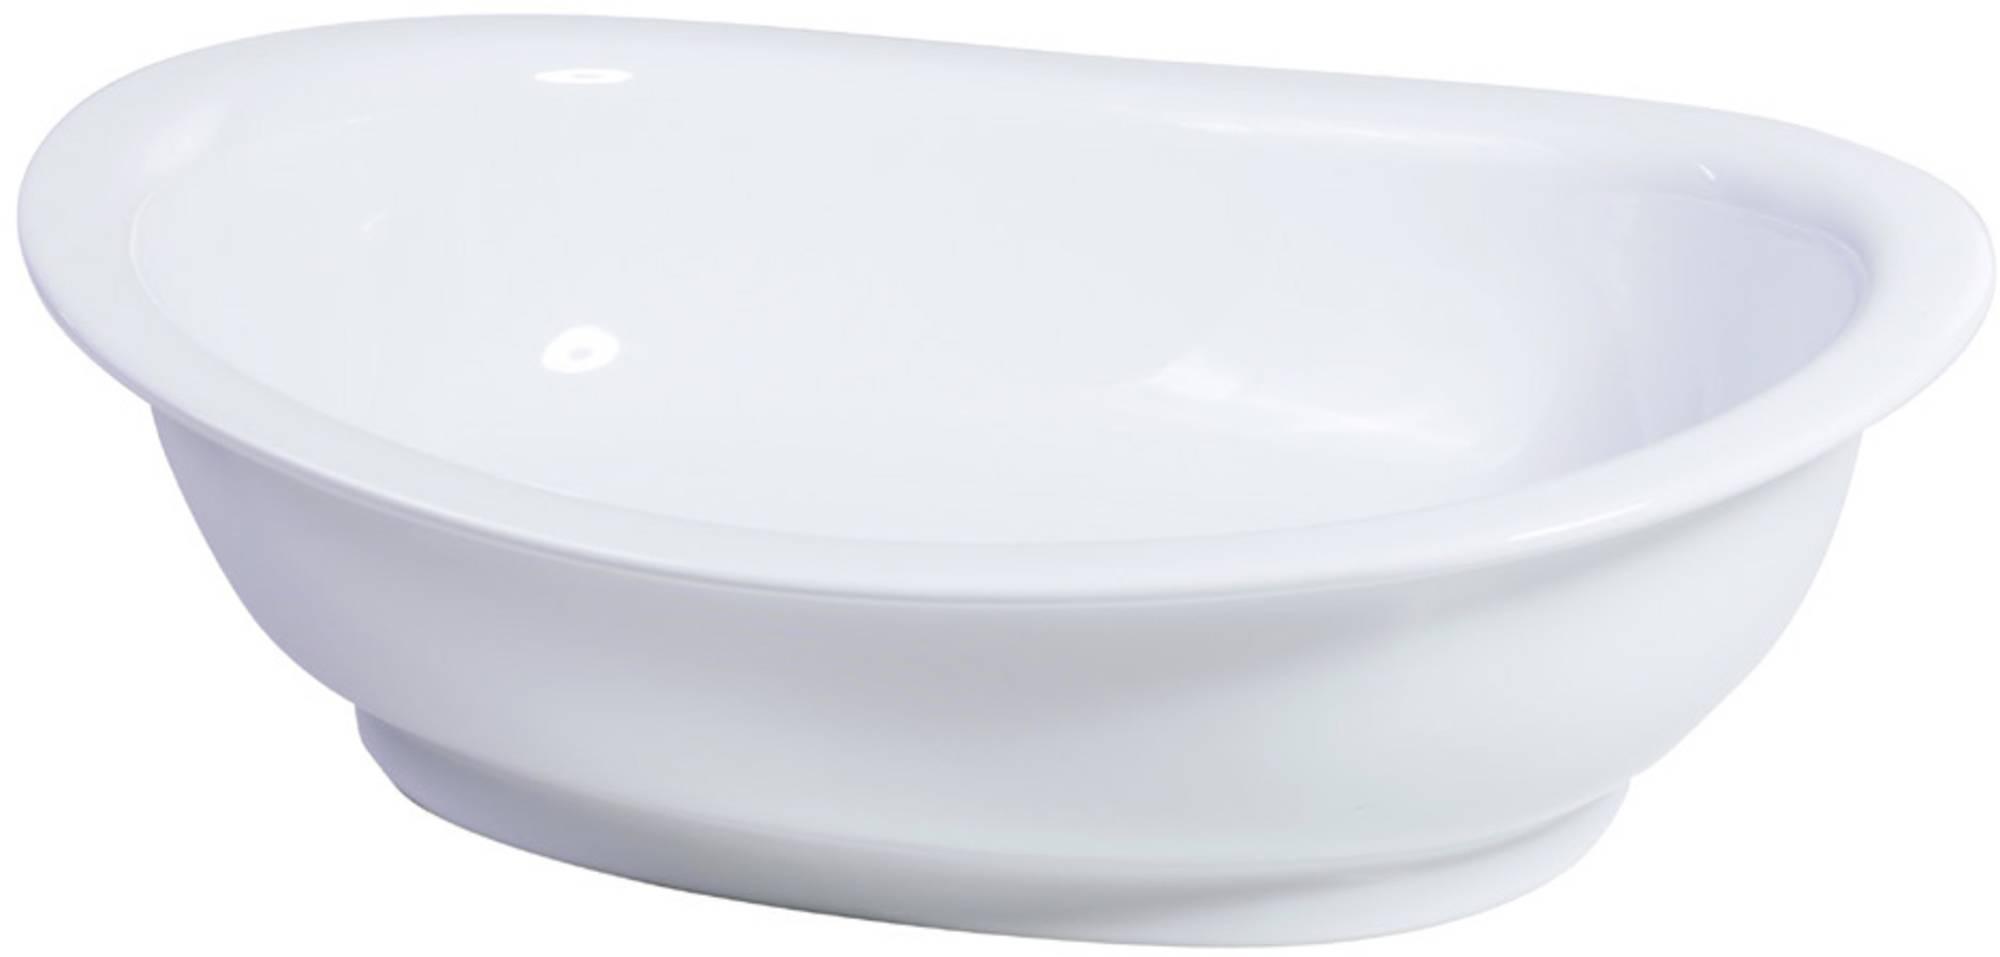 Van Heck Opbouwkom 53,5x16,5 cm zonder overloop porselein White